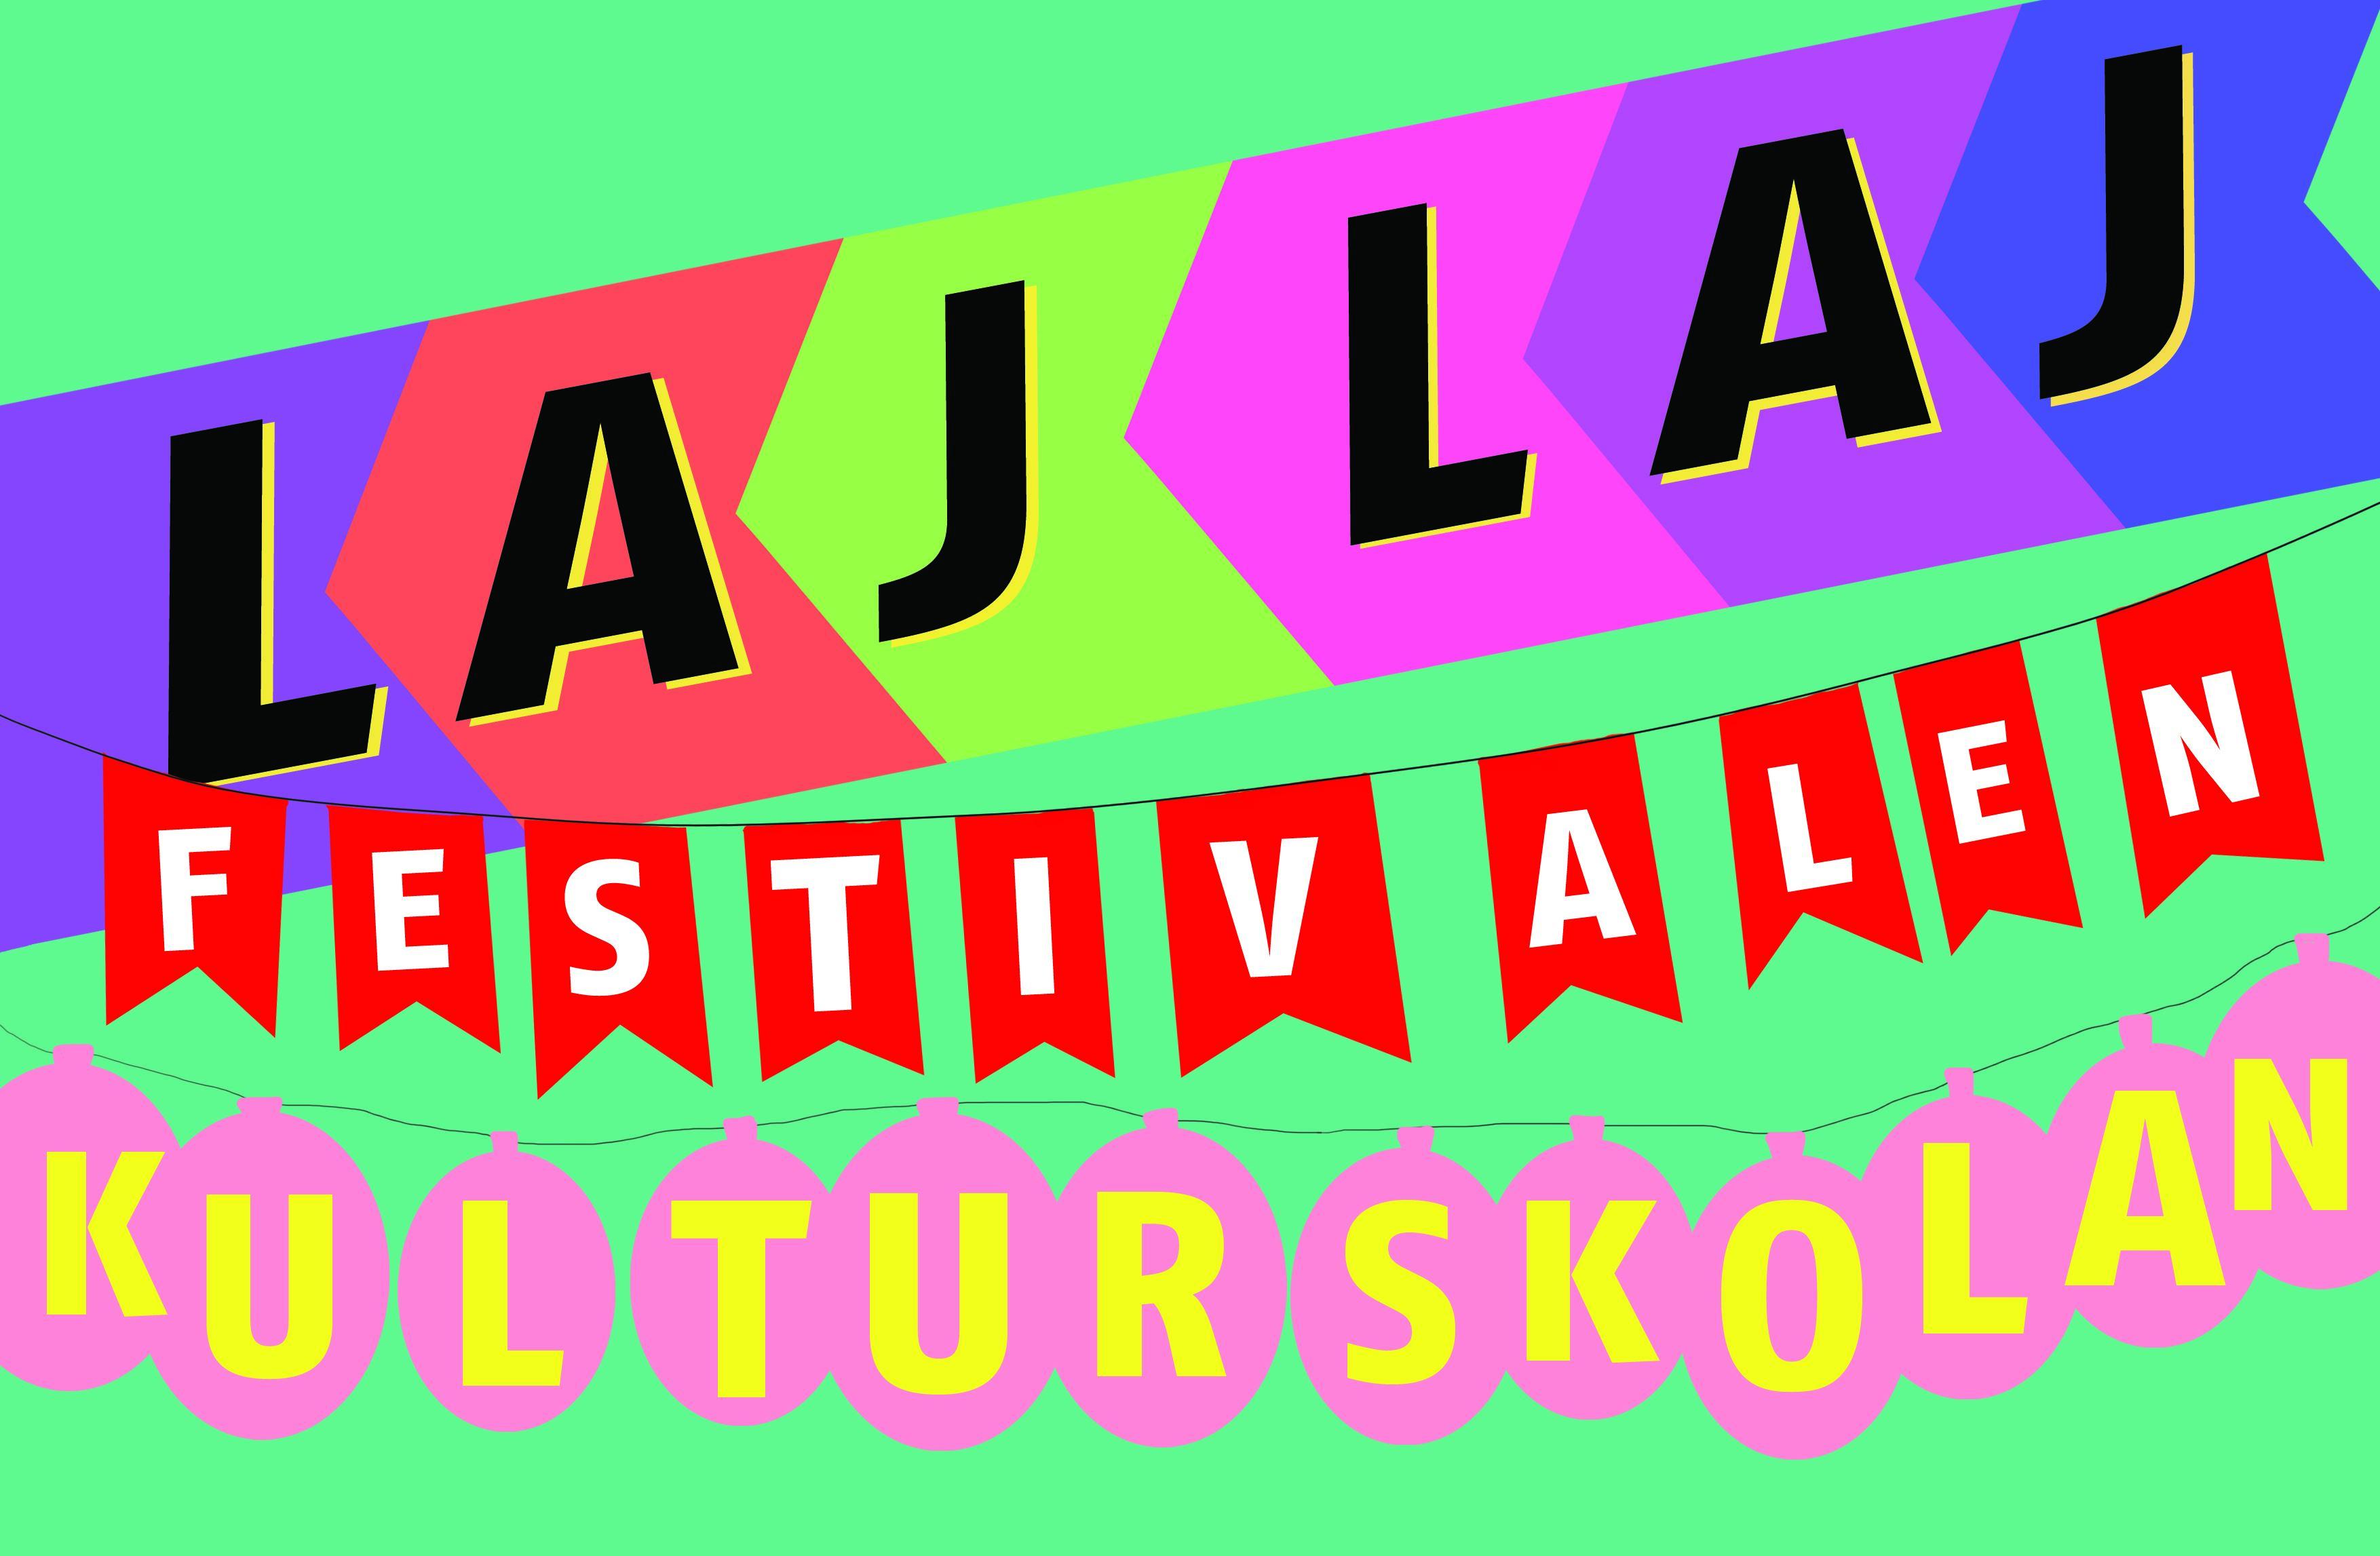 Kulturskolans Lajlajfestival